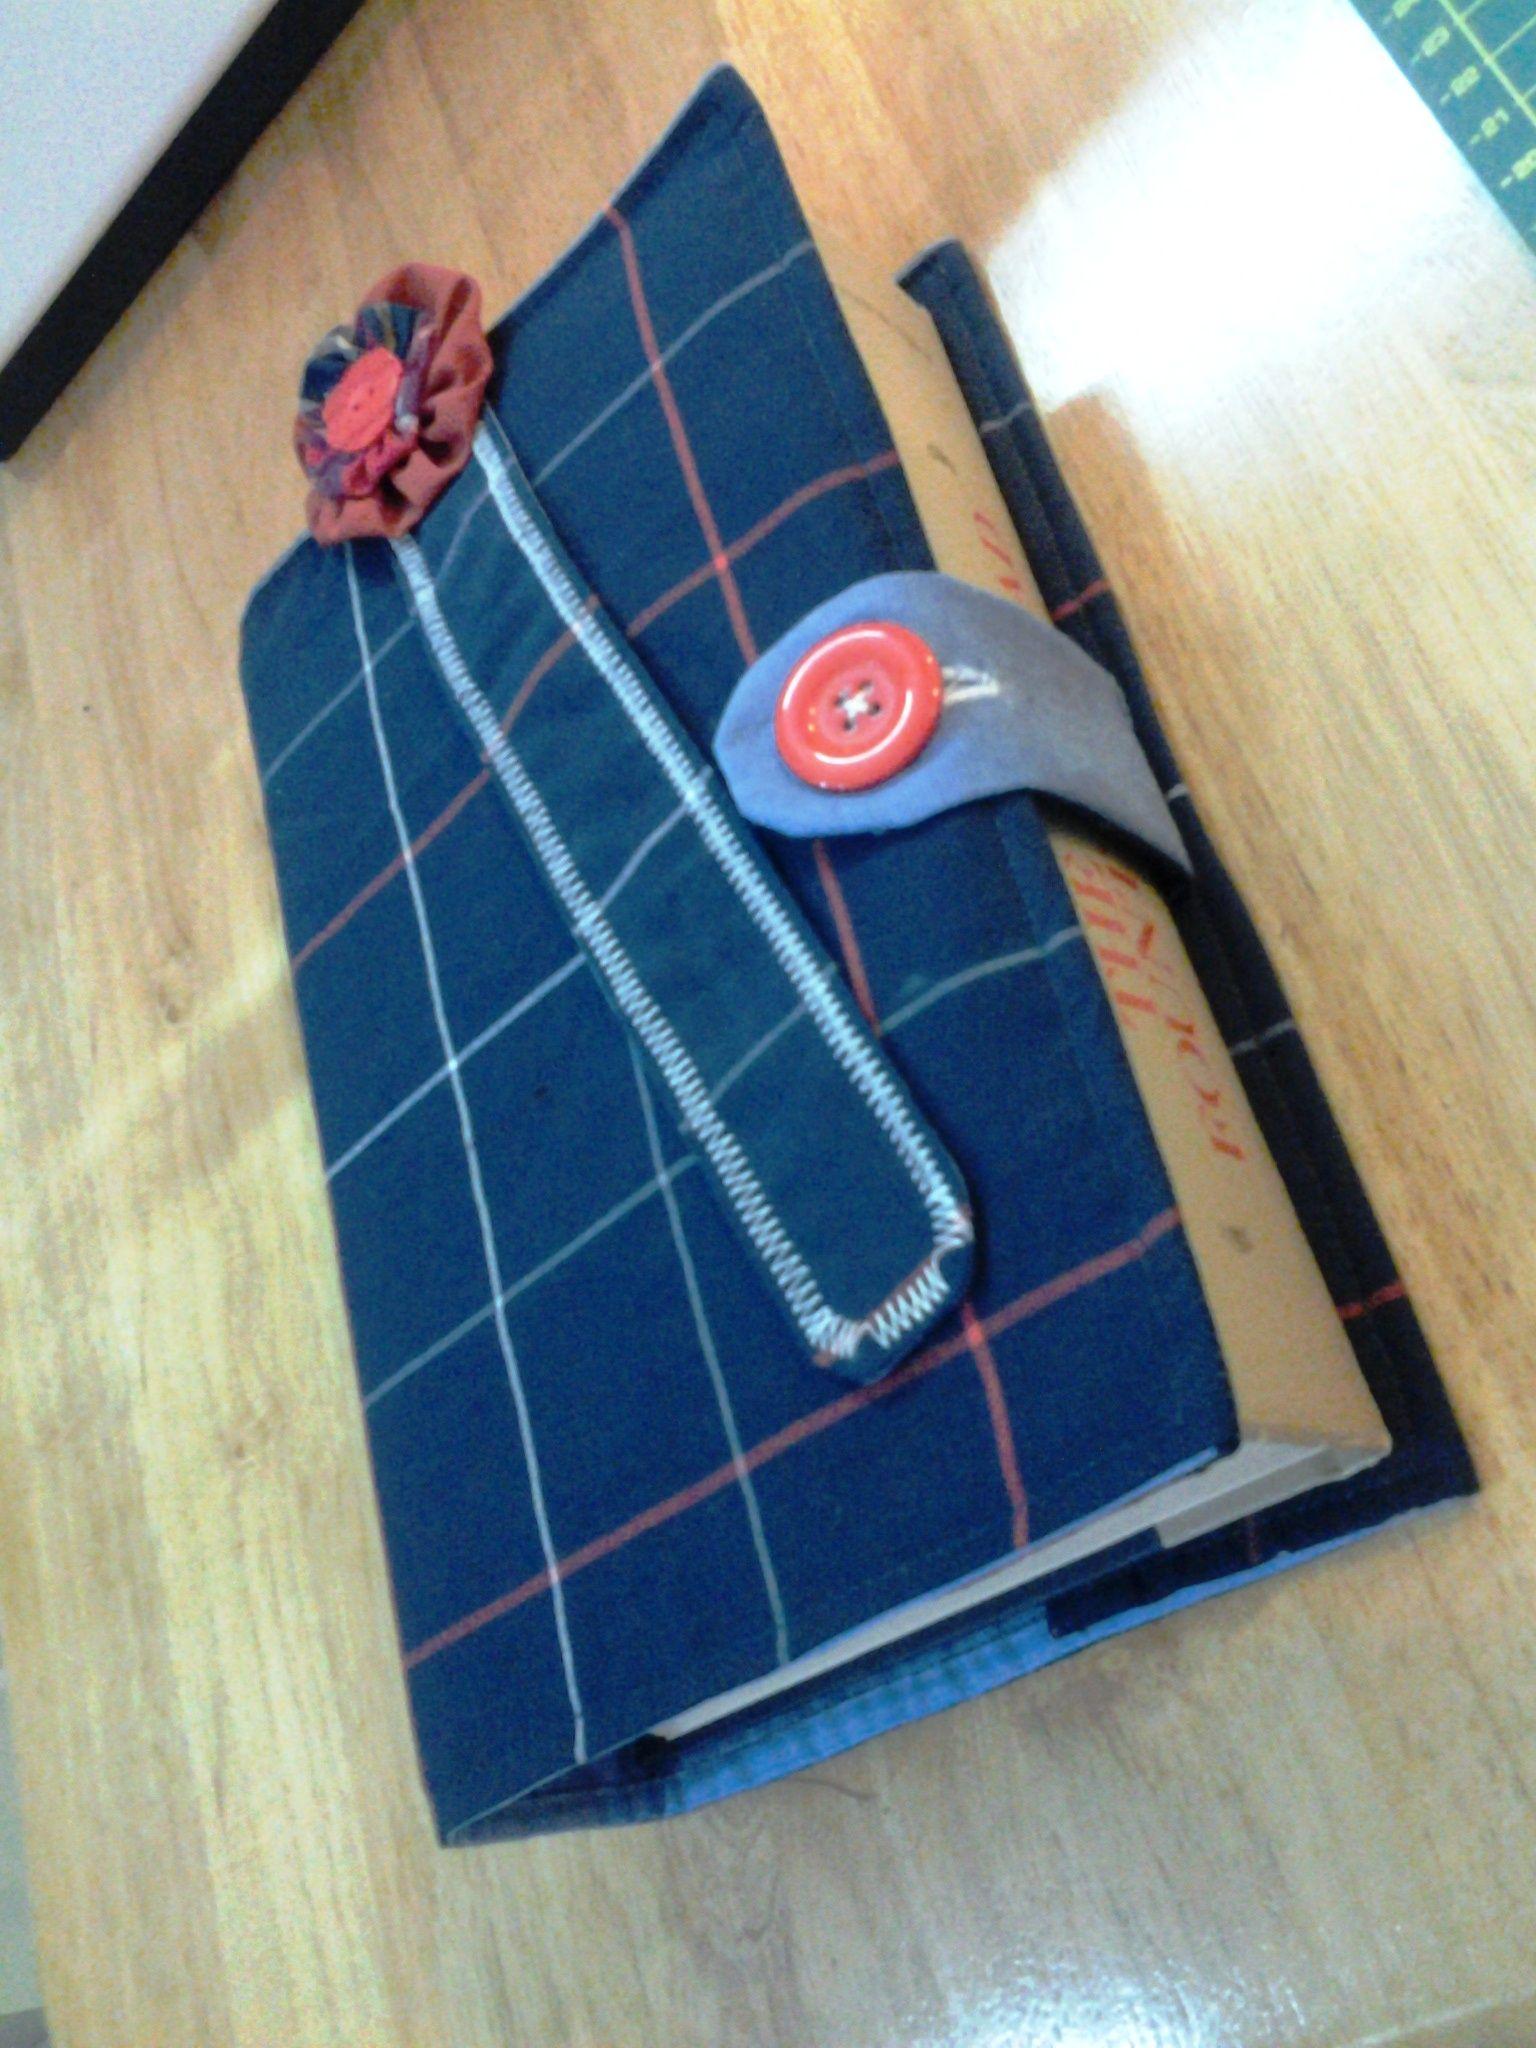 Easy Diy Fabric Wreath For Summer: Easy DIY Fabric Book-cover & Book-mark